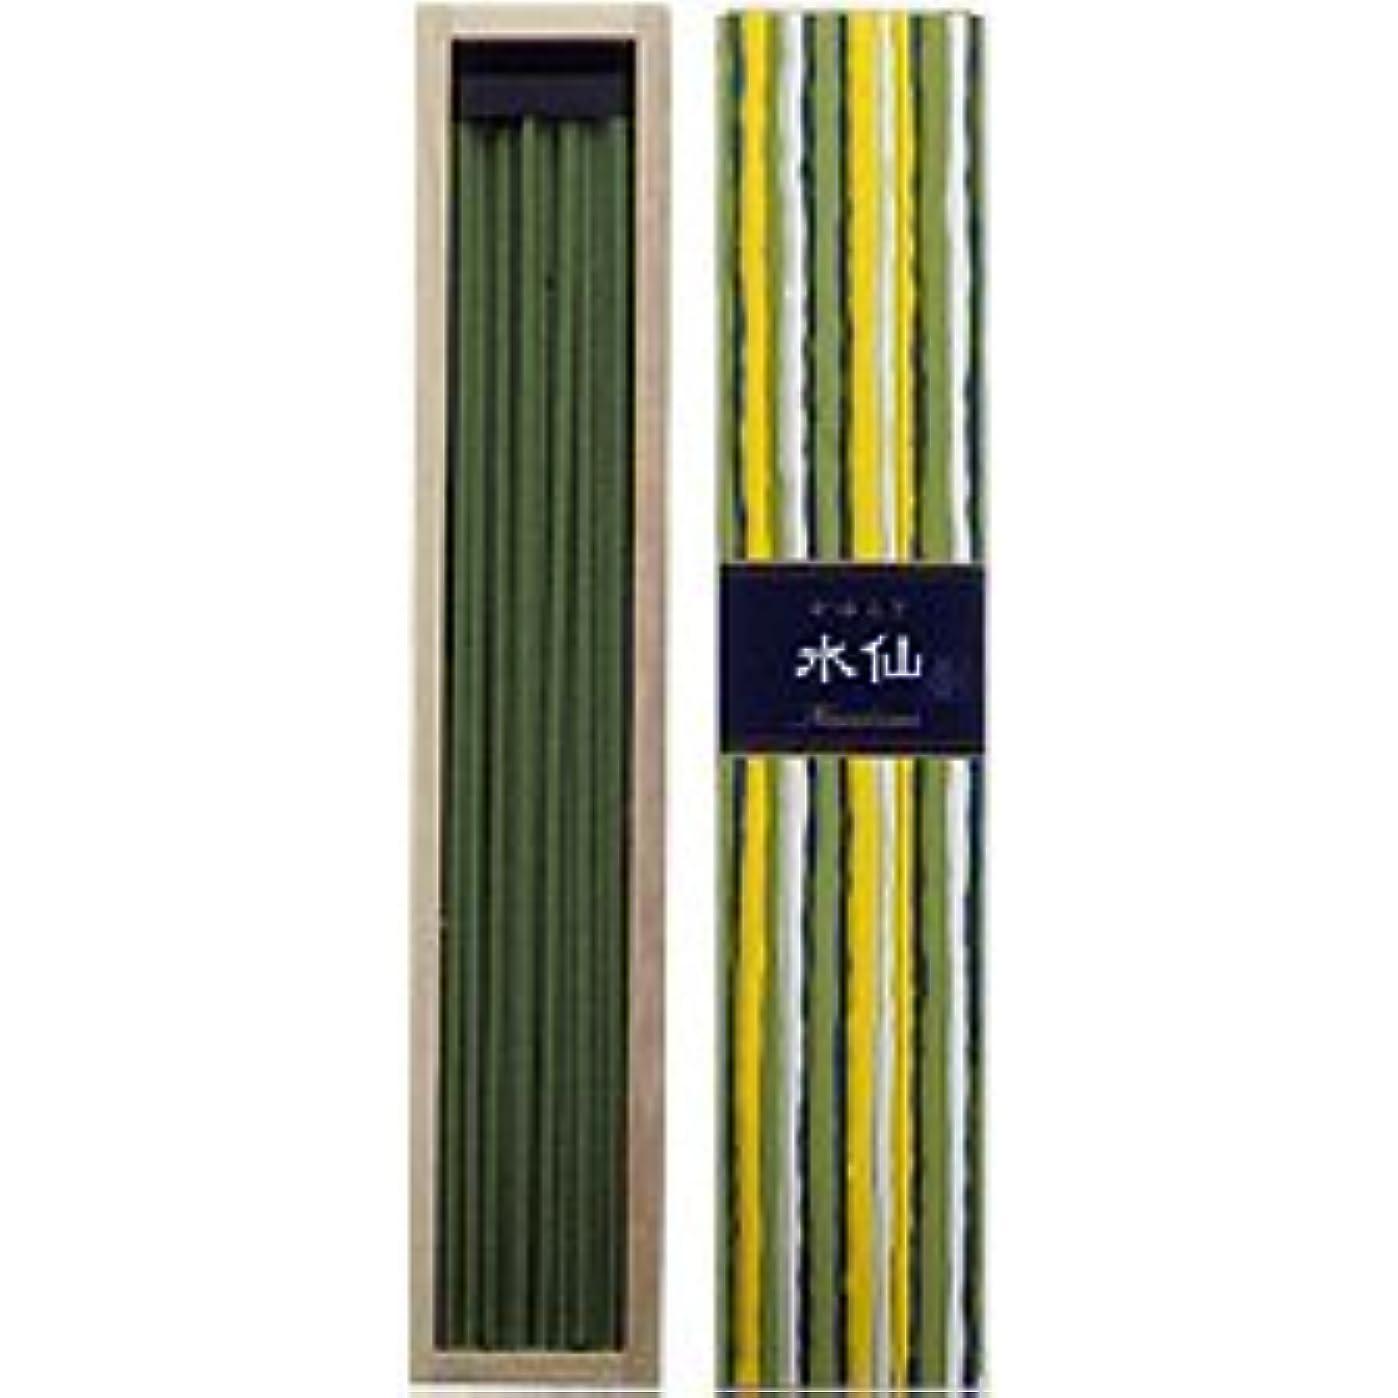 Kayuragi Incense Sticks – Narcissus